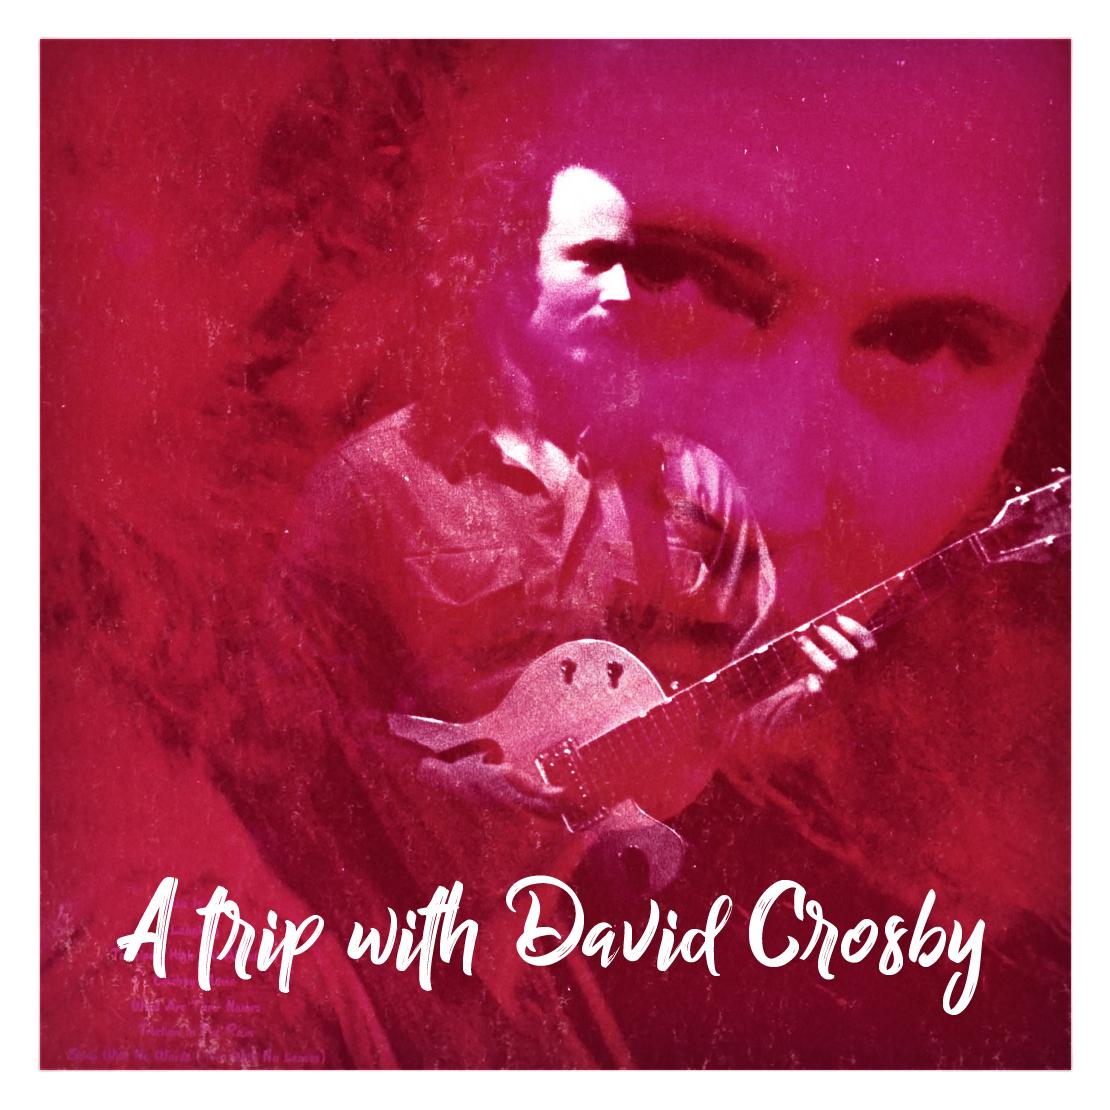 A Trip With David Crosby